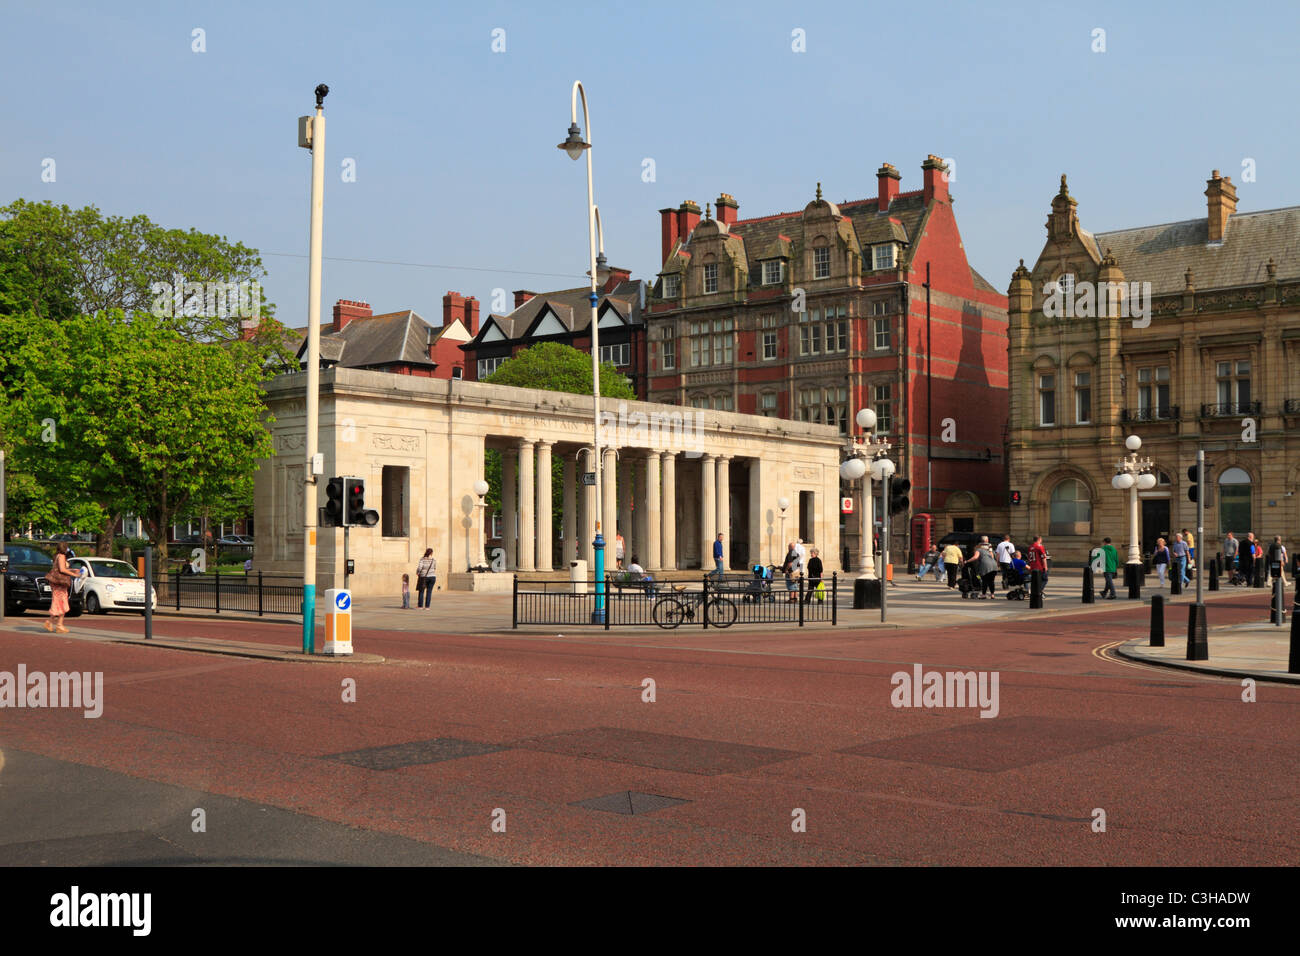 War Memorial on Lord Street, Southport, Merseyside, Lancashire, England, UK. Stock Photo